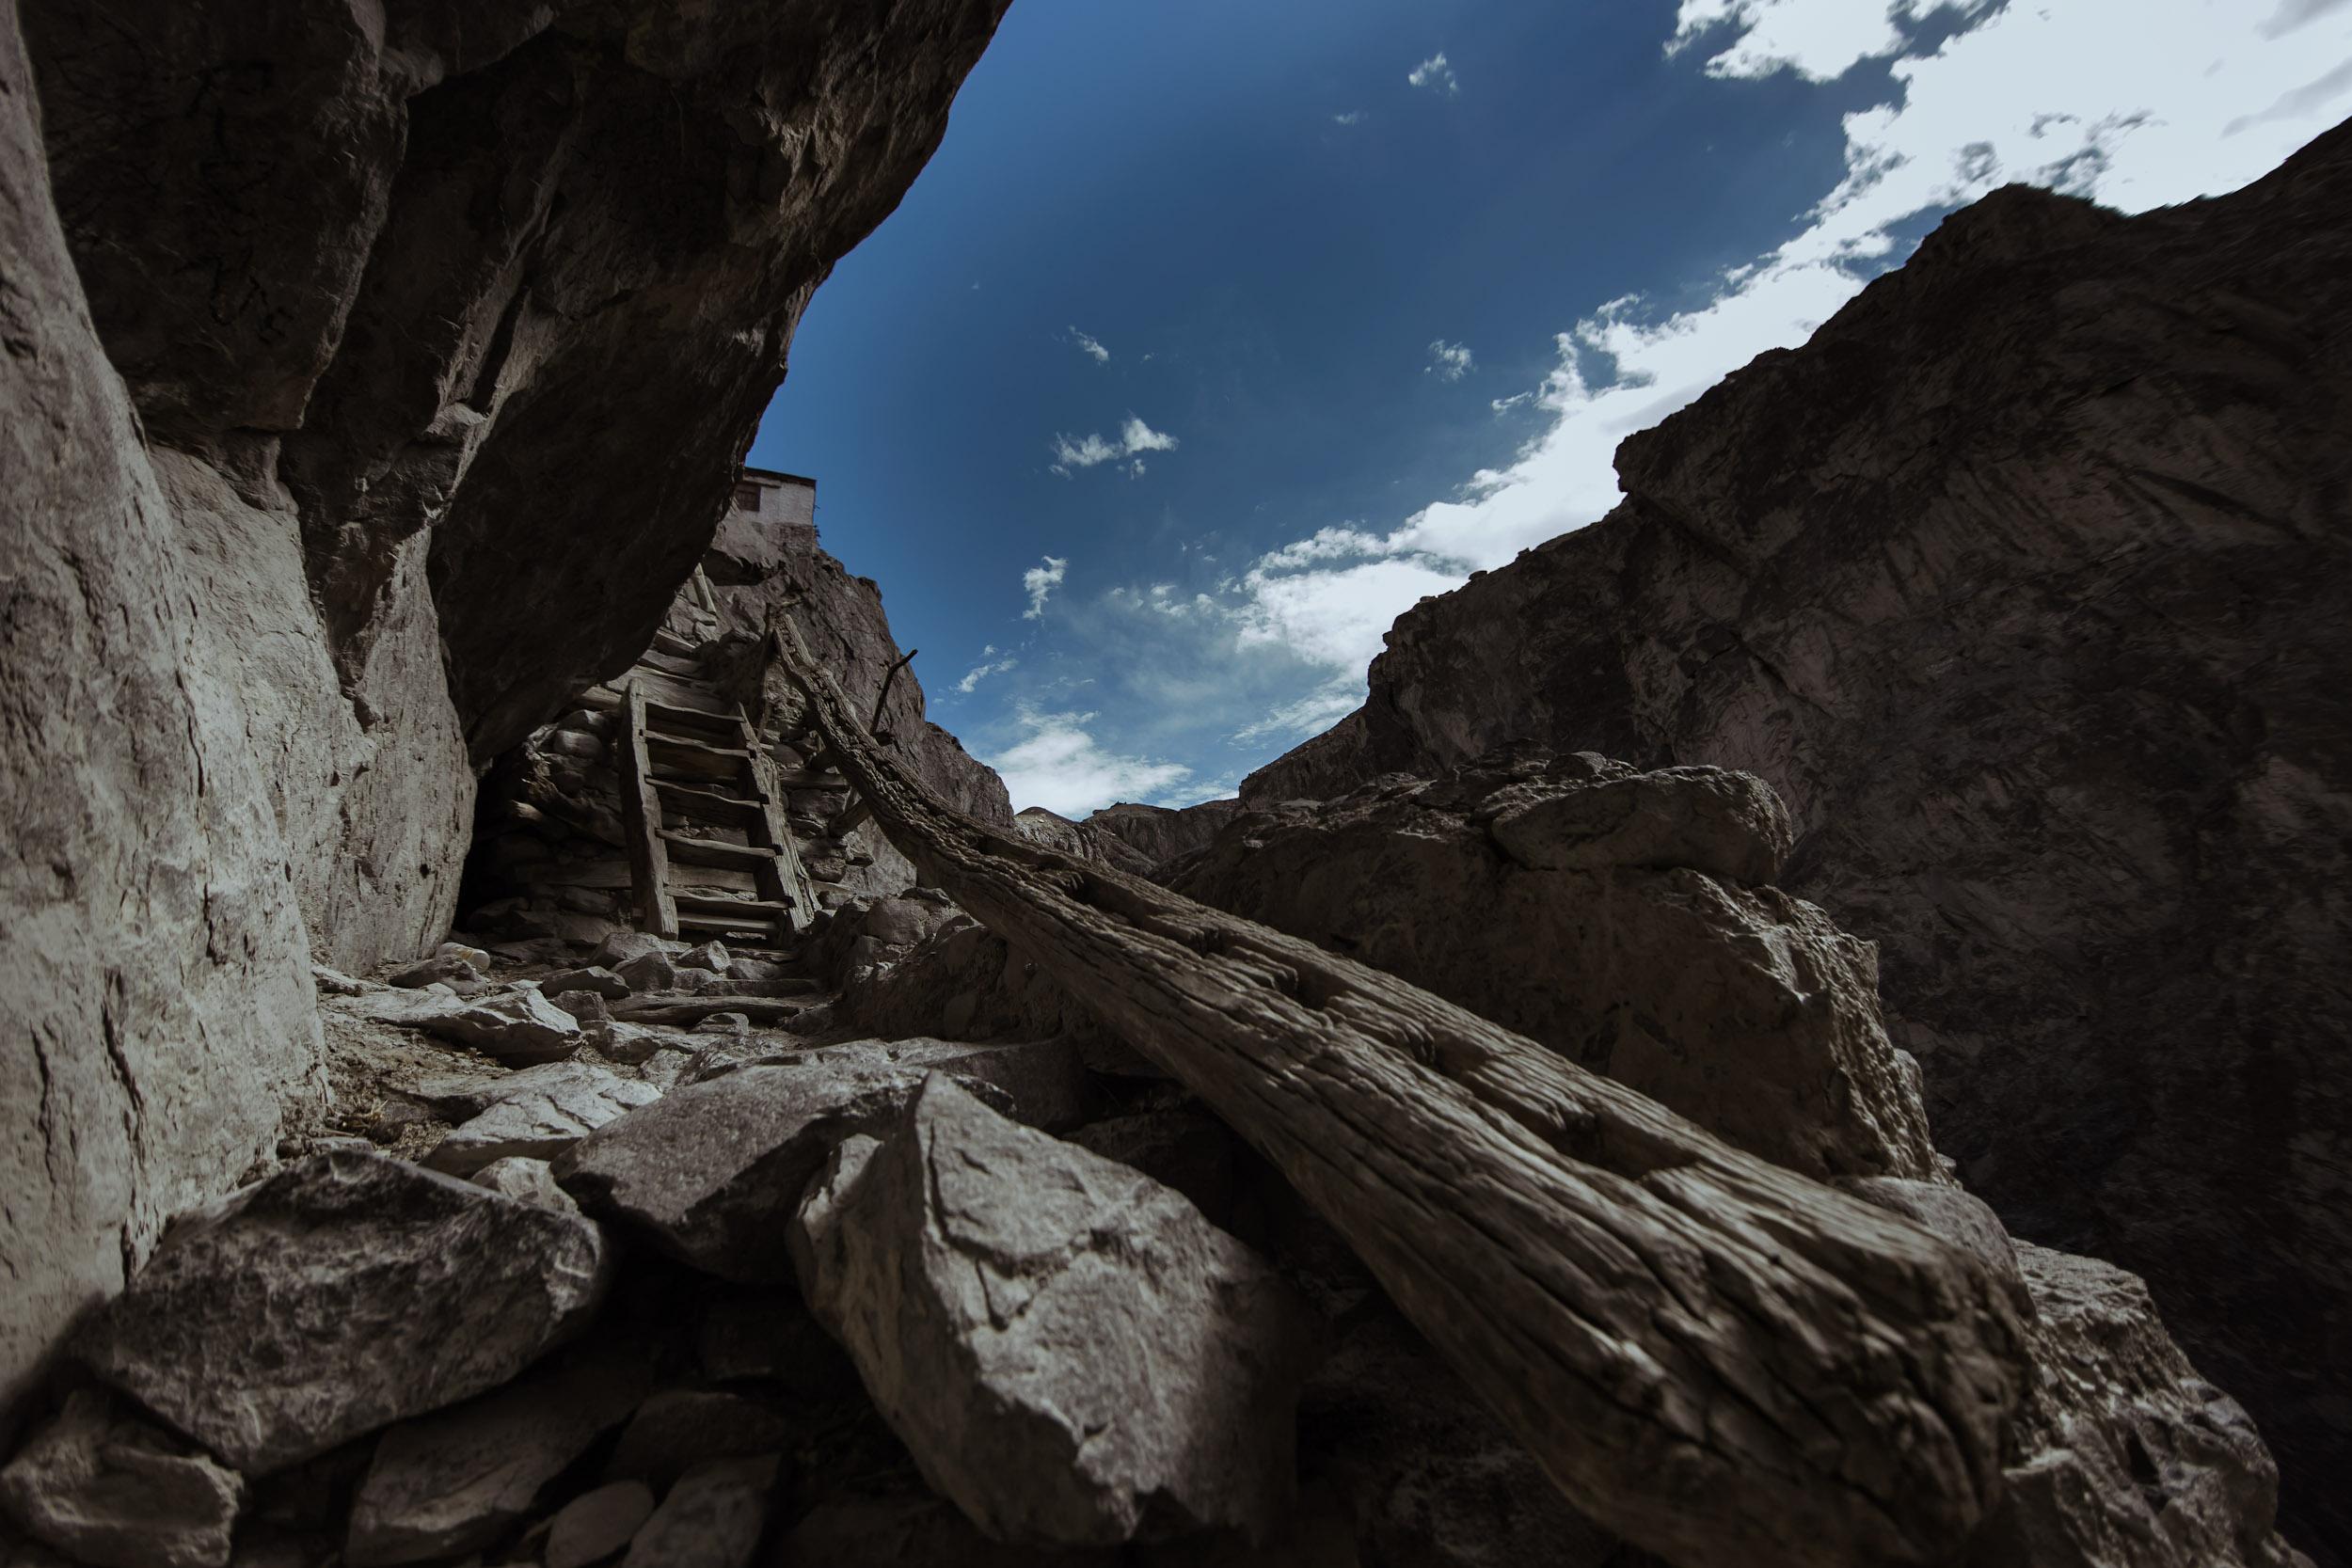 Sindhur_Photography_Travel_Landscape_Ladakh-7.JPG